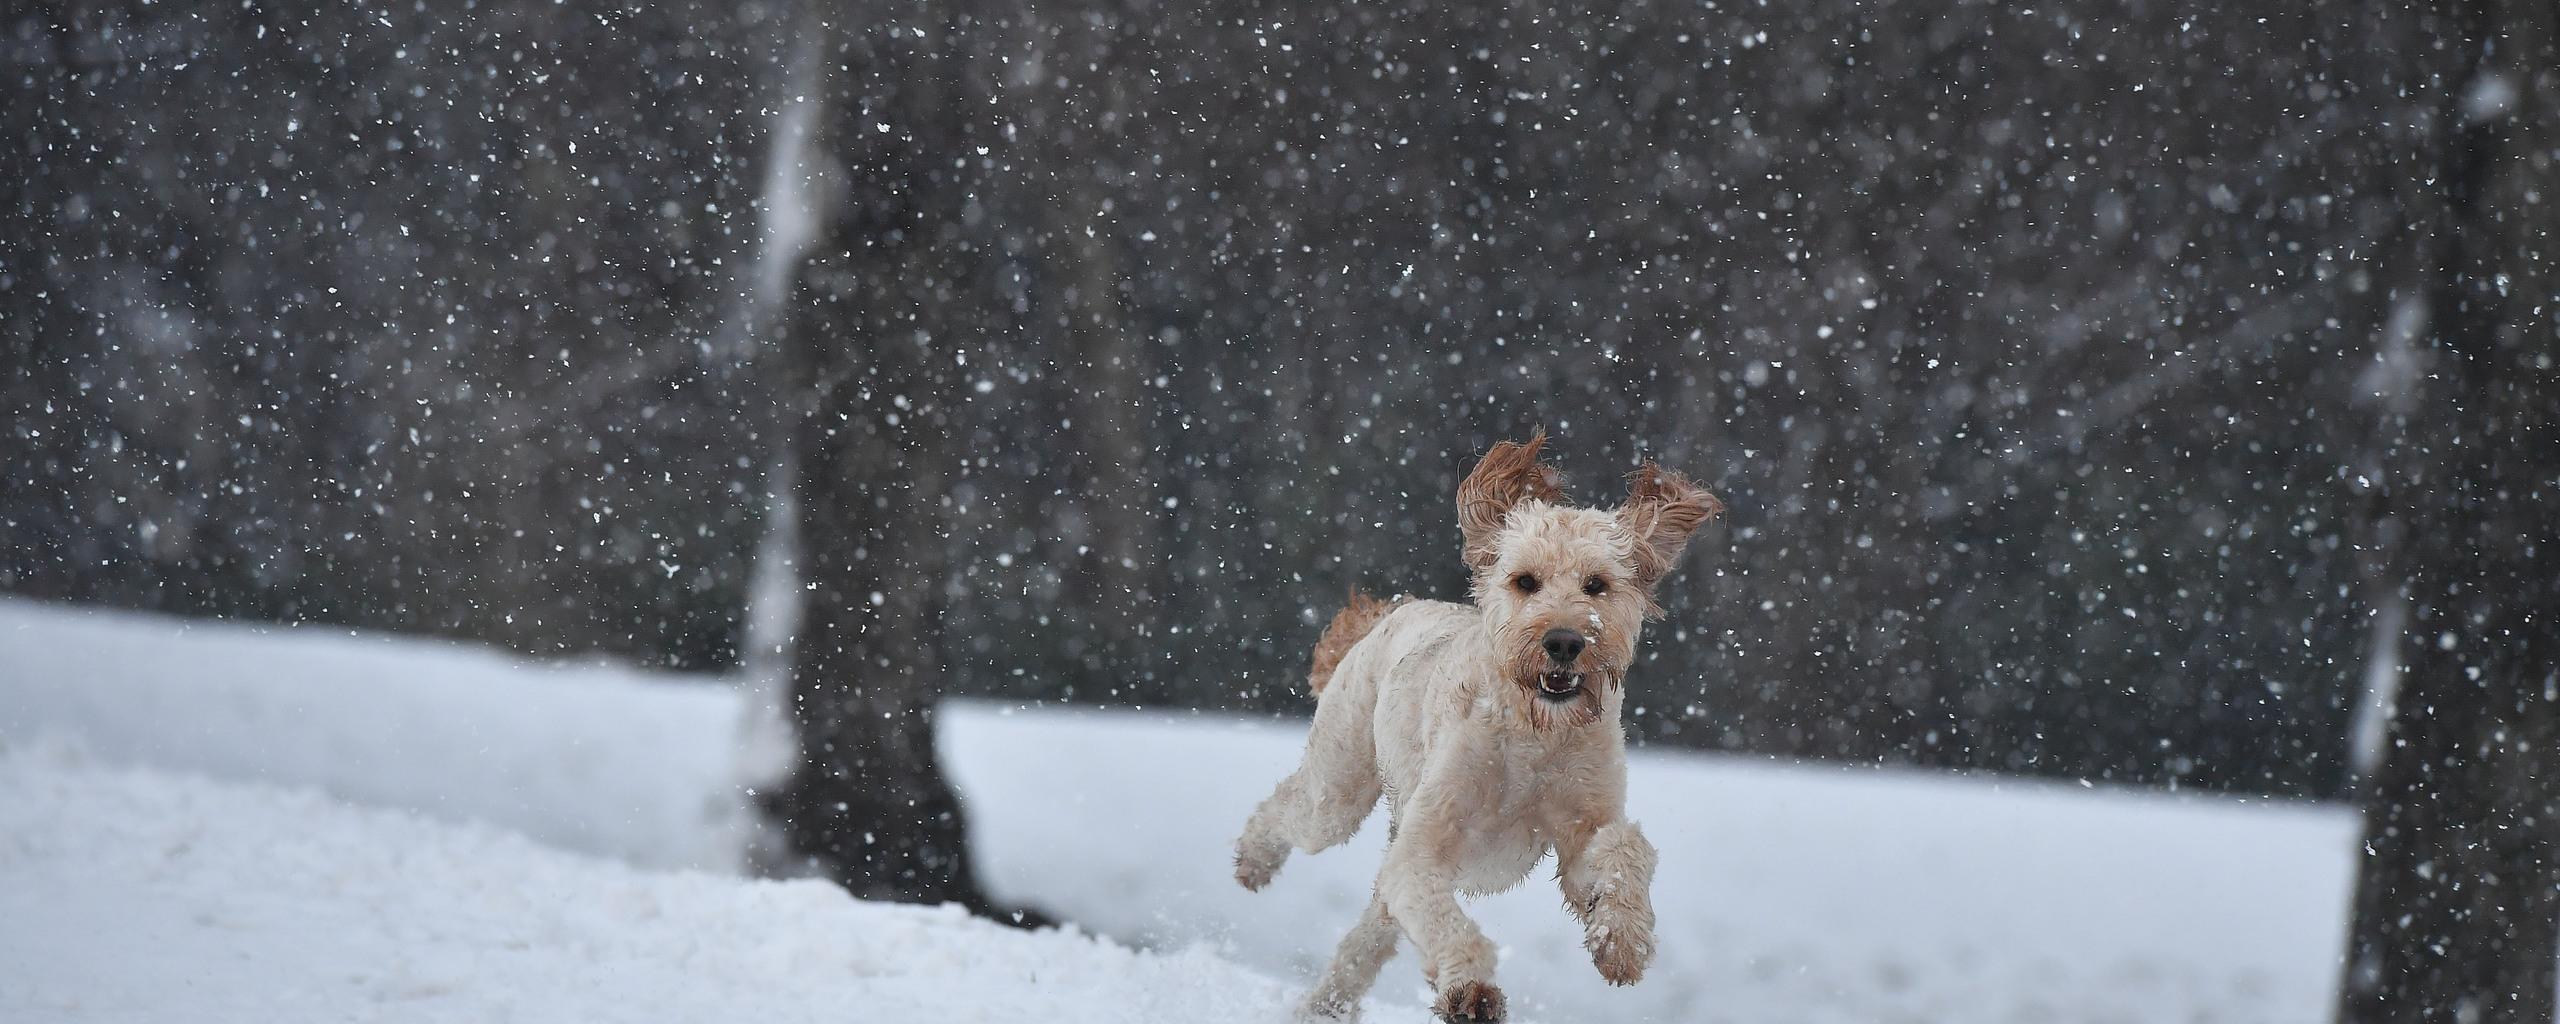 dog-running-in-a-snow-oz.jpg